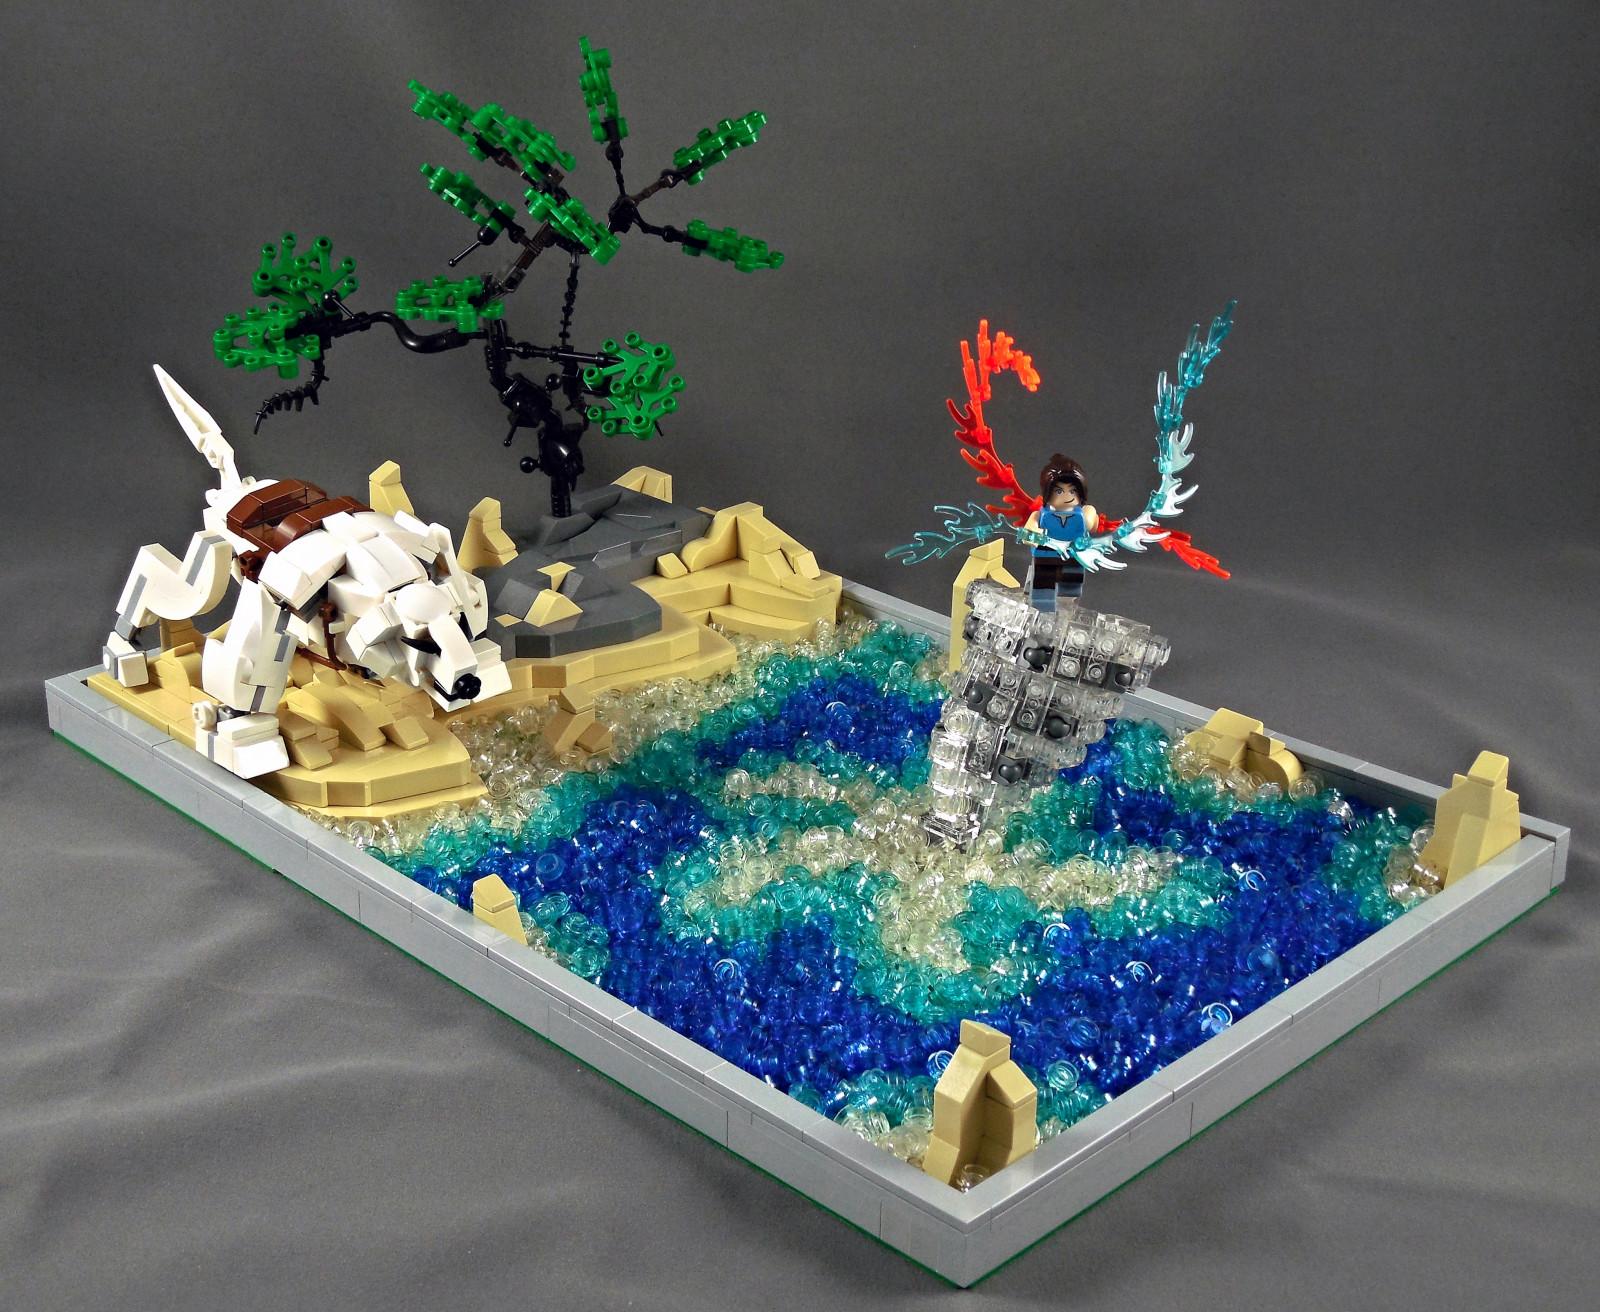 Sfondi cartone animato lego cane avatar giocattolo korra